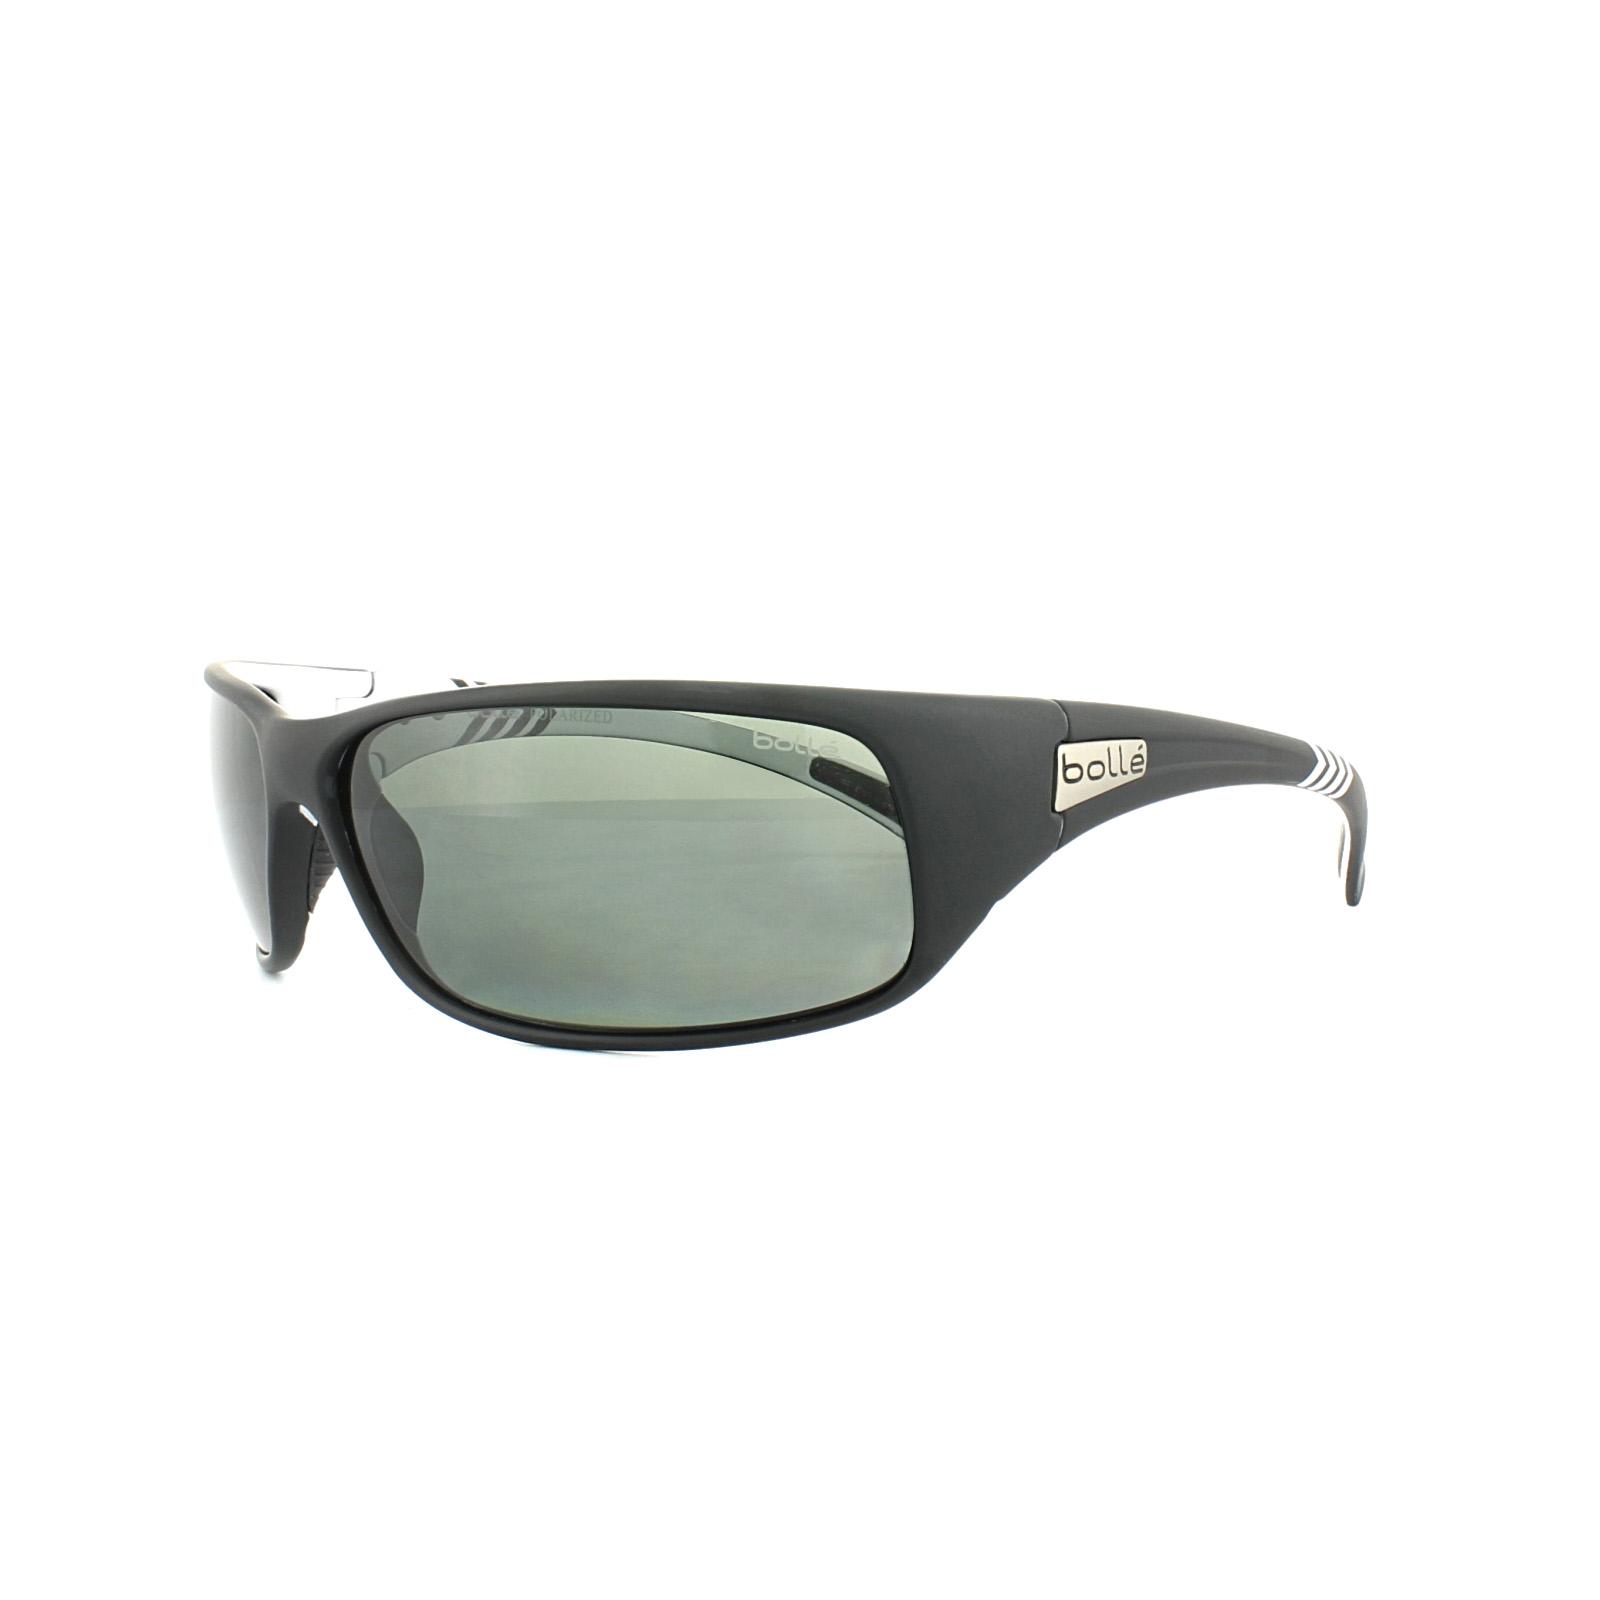 16aa26e1bdc Sentinel Bolle Sunglasses Recoil 11808 Matt Black White Arrow TNS Grey  Polarized